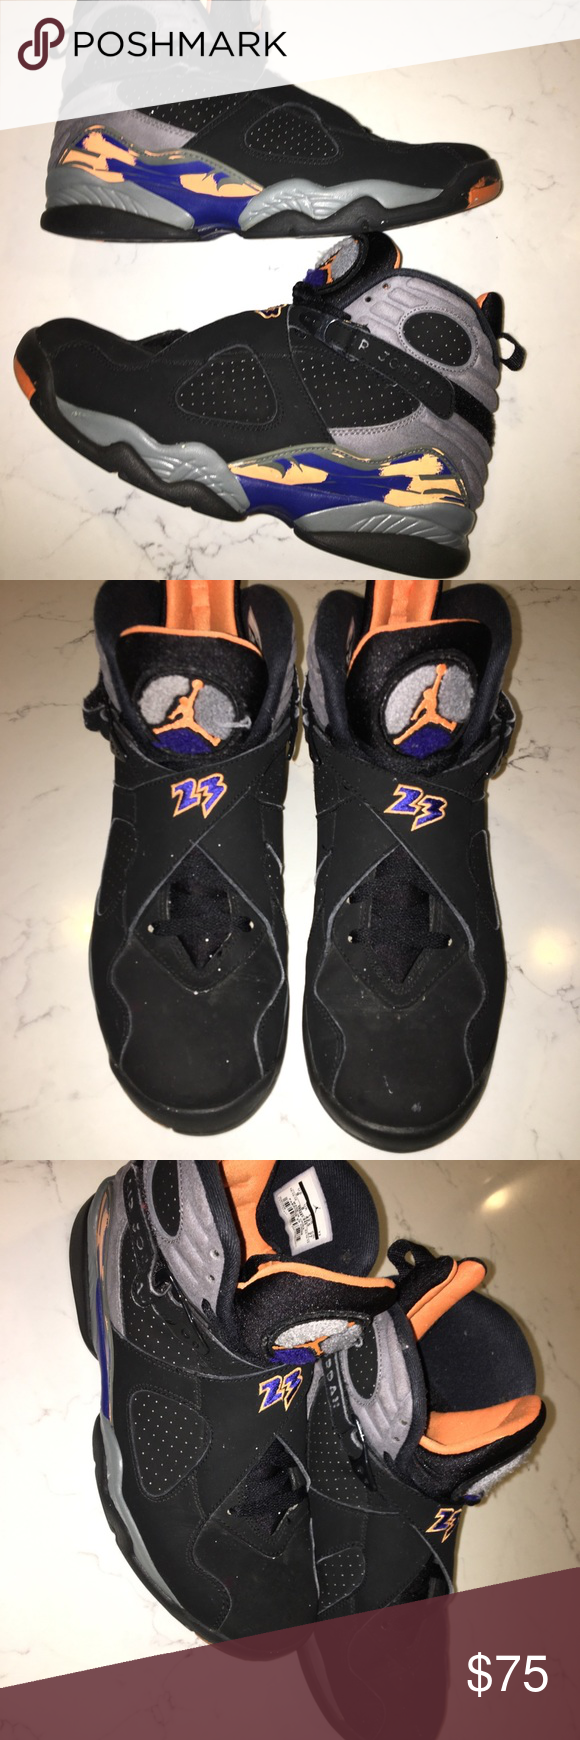 best authentic f99ed 086e1 Jordan 8 Retro Phoenix Suns- Size 9 Nike Jordan 8s Colorway  BLACK BRIGHT  CITRUS-COOL GREY-DEEP ROYAL BLUE RETAIL PRICE  160 RELEASE DATE 2013-05-18  No box.